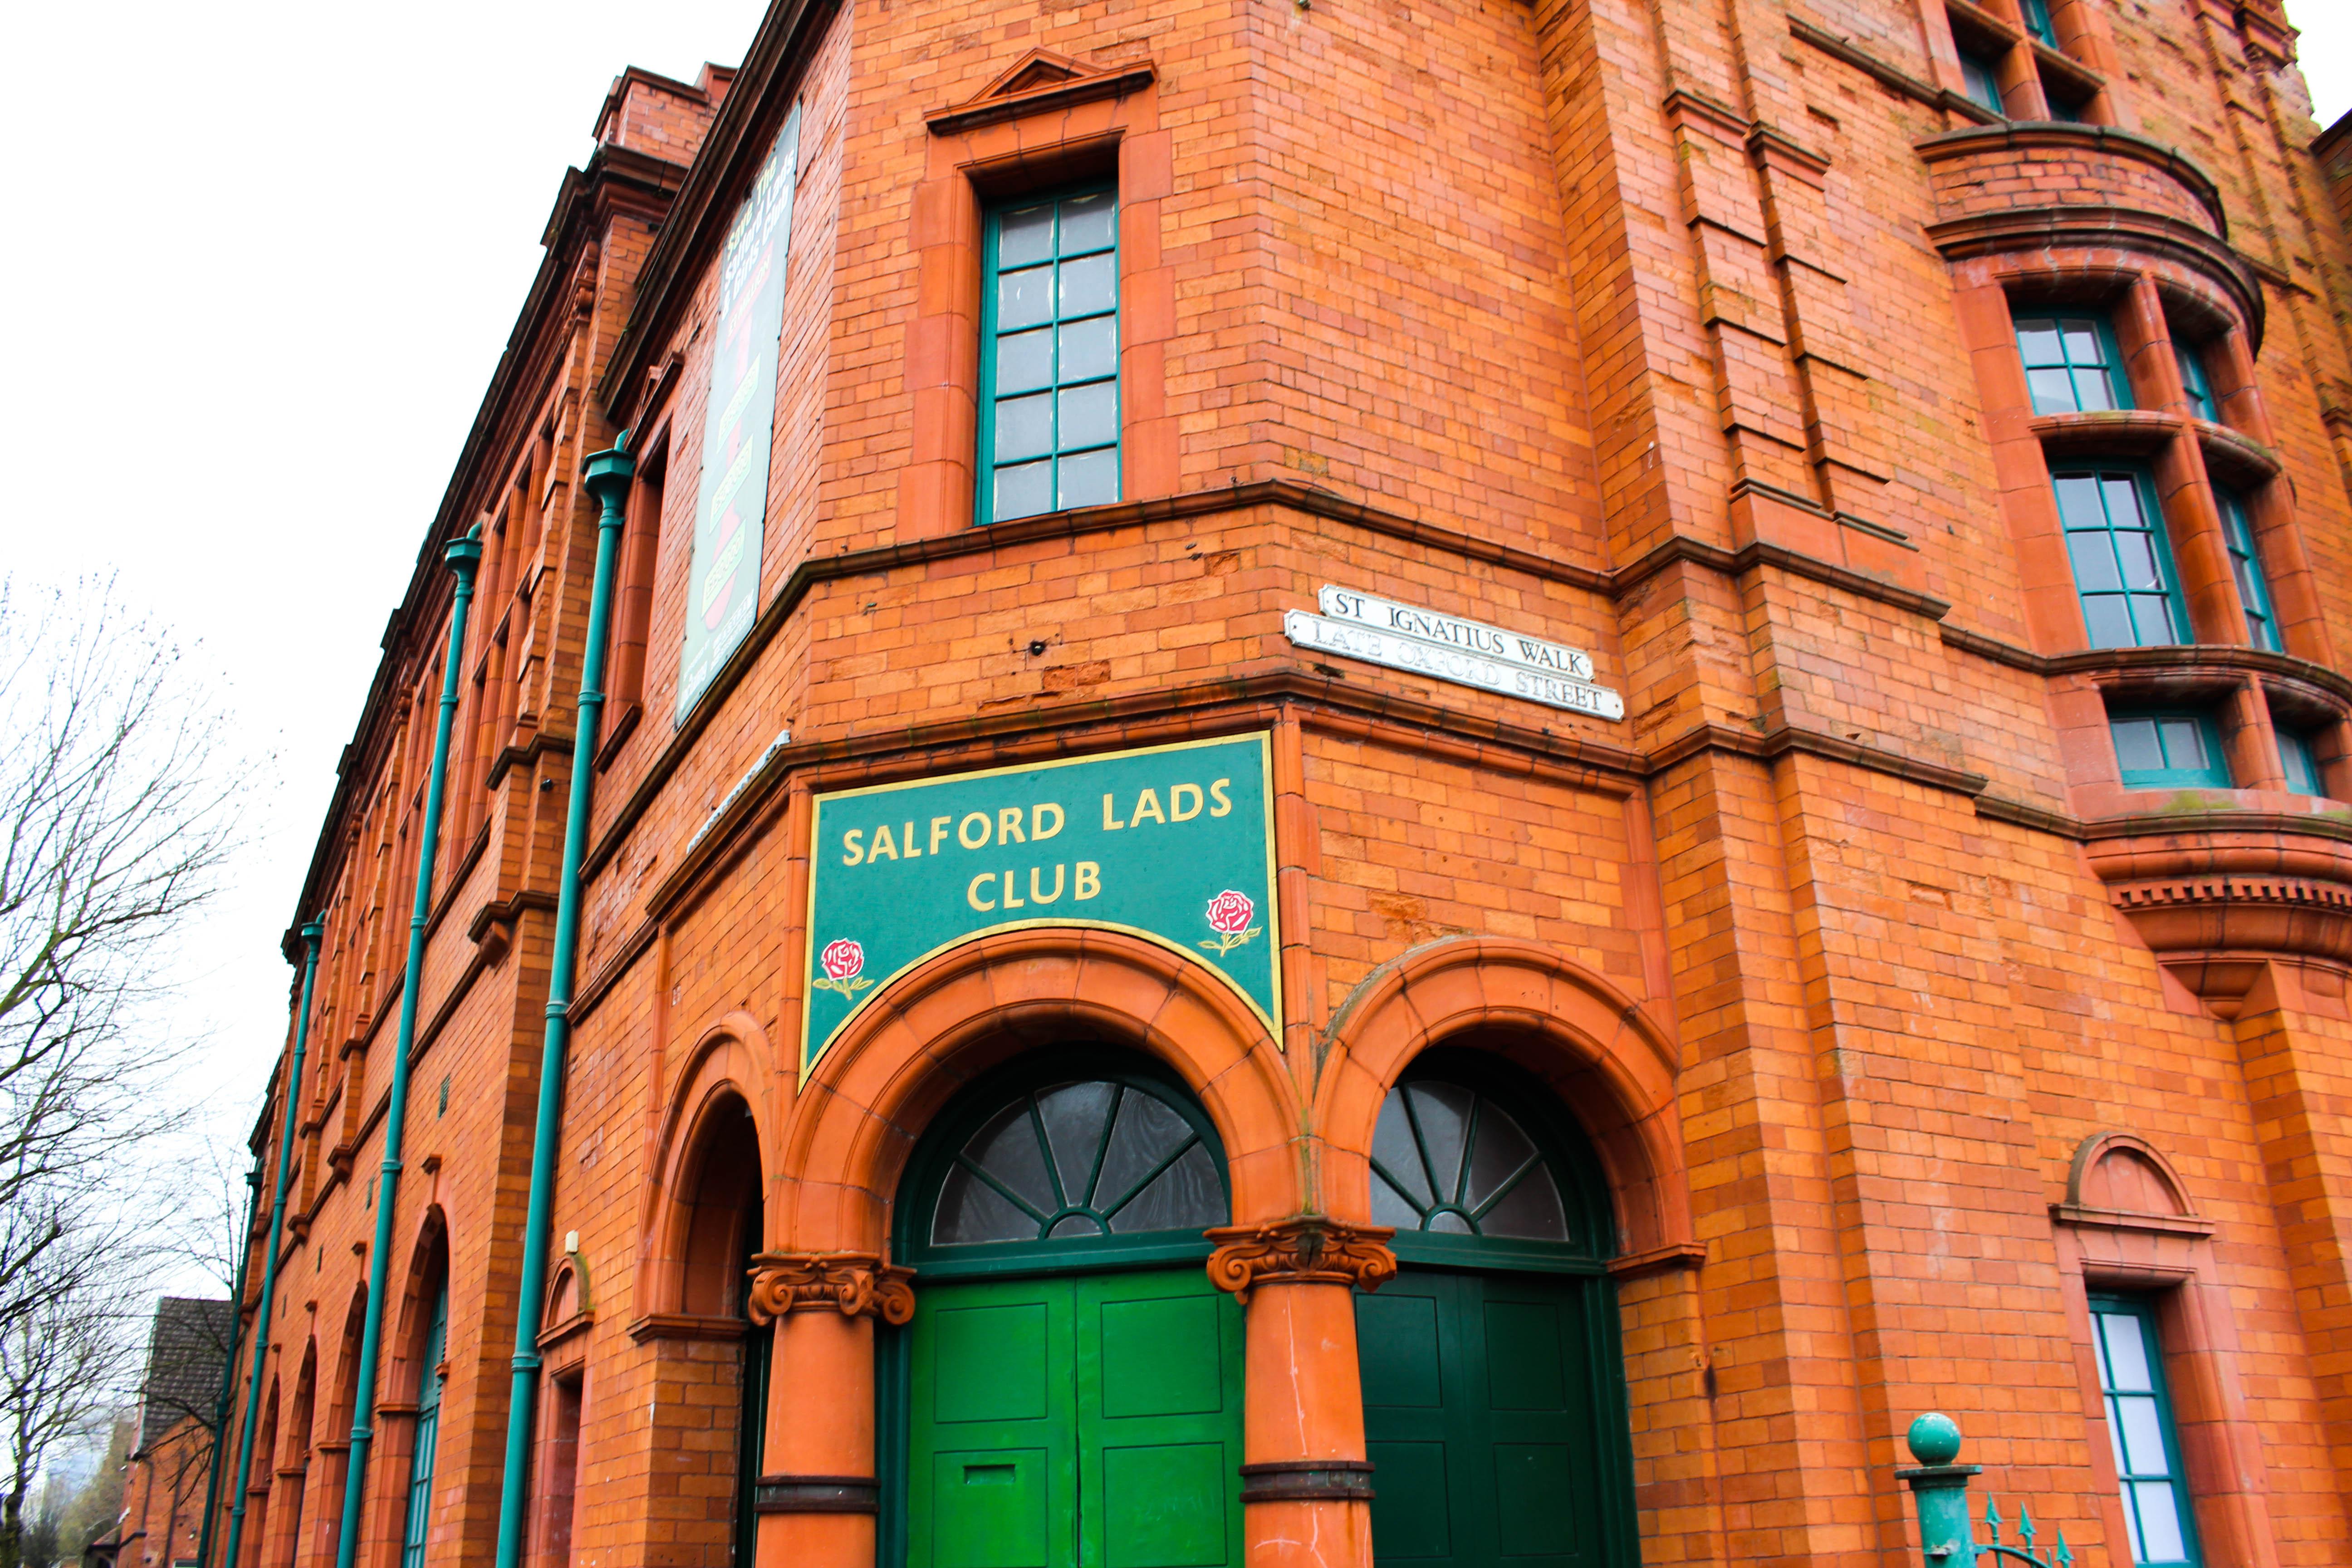 Image: Salford Lads Club Edited